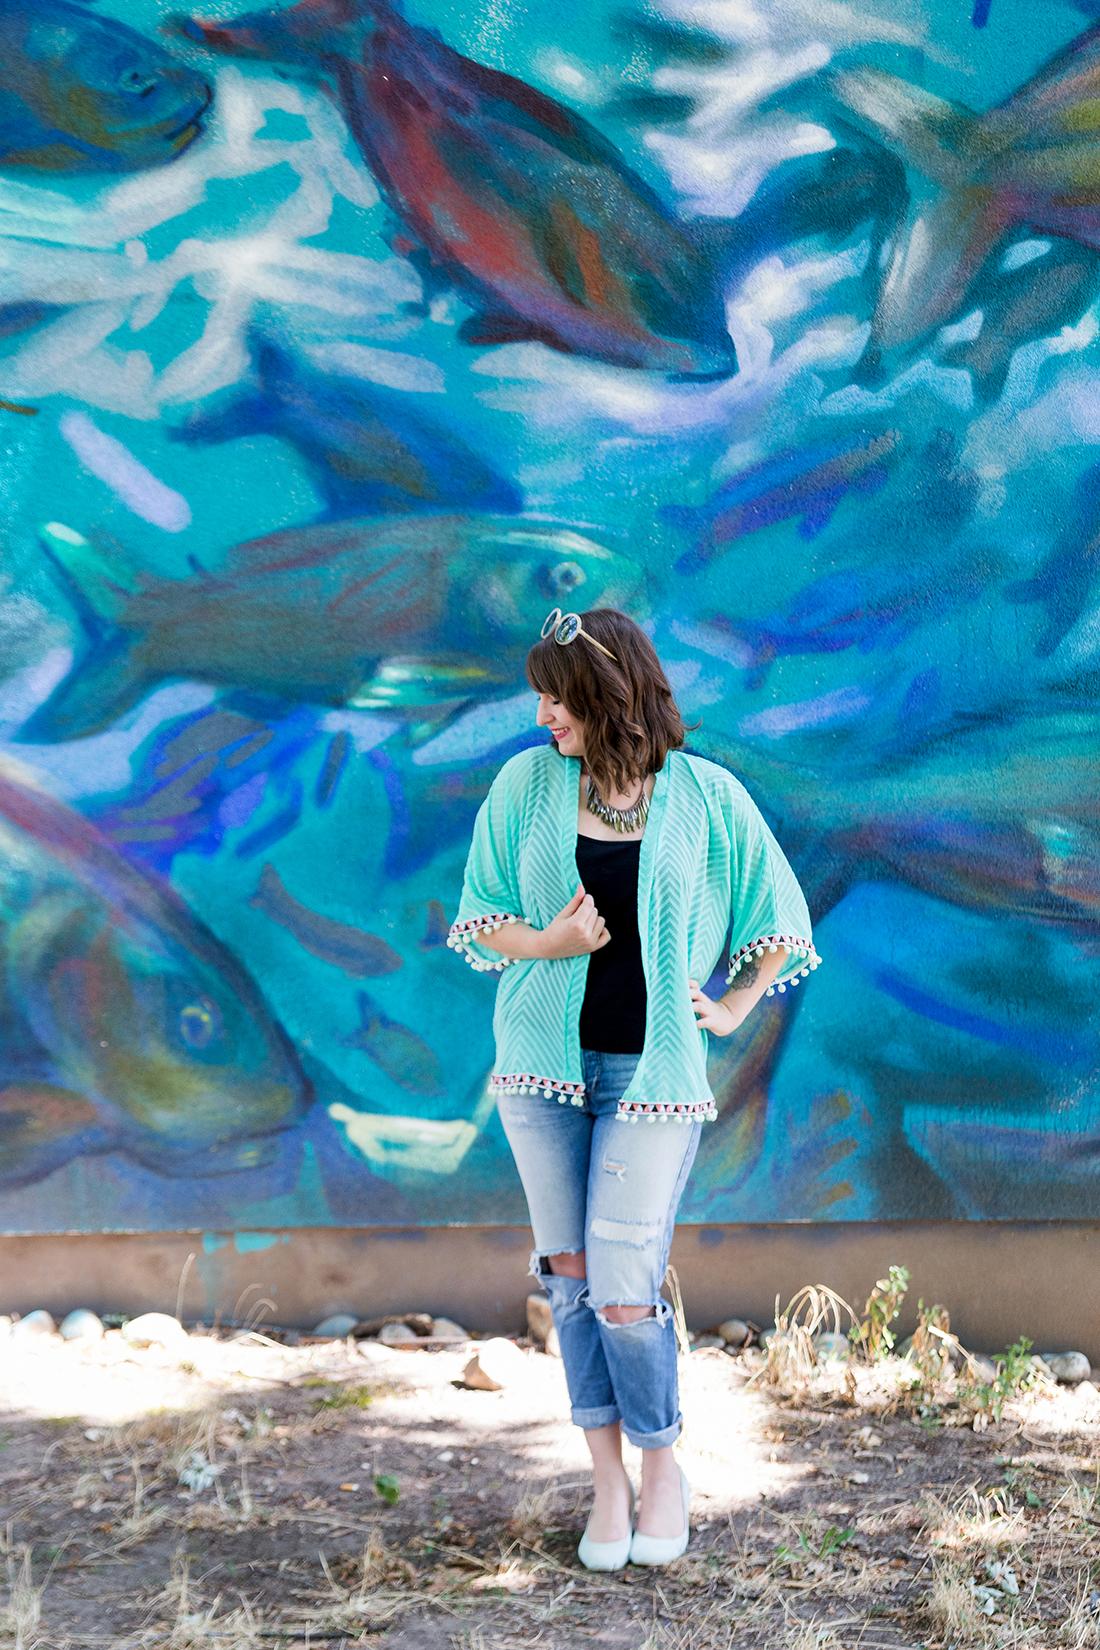 naehdirwas: Transparenz - mein Chiffon-Kimono in Mint | mein feenstaub